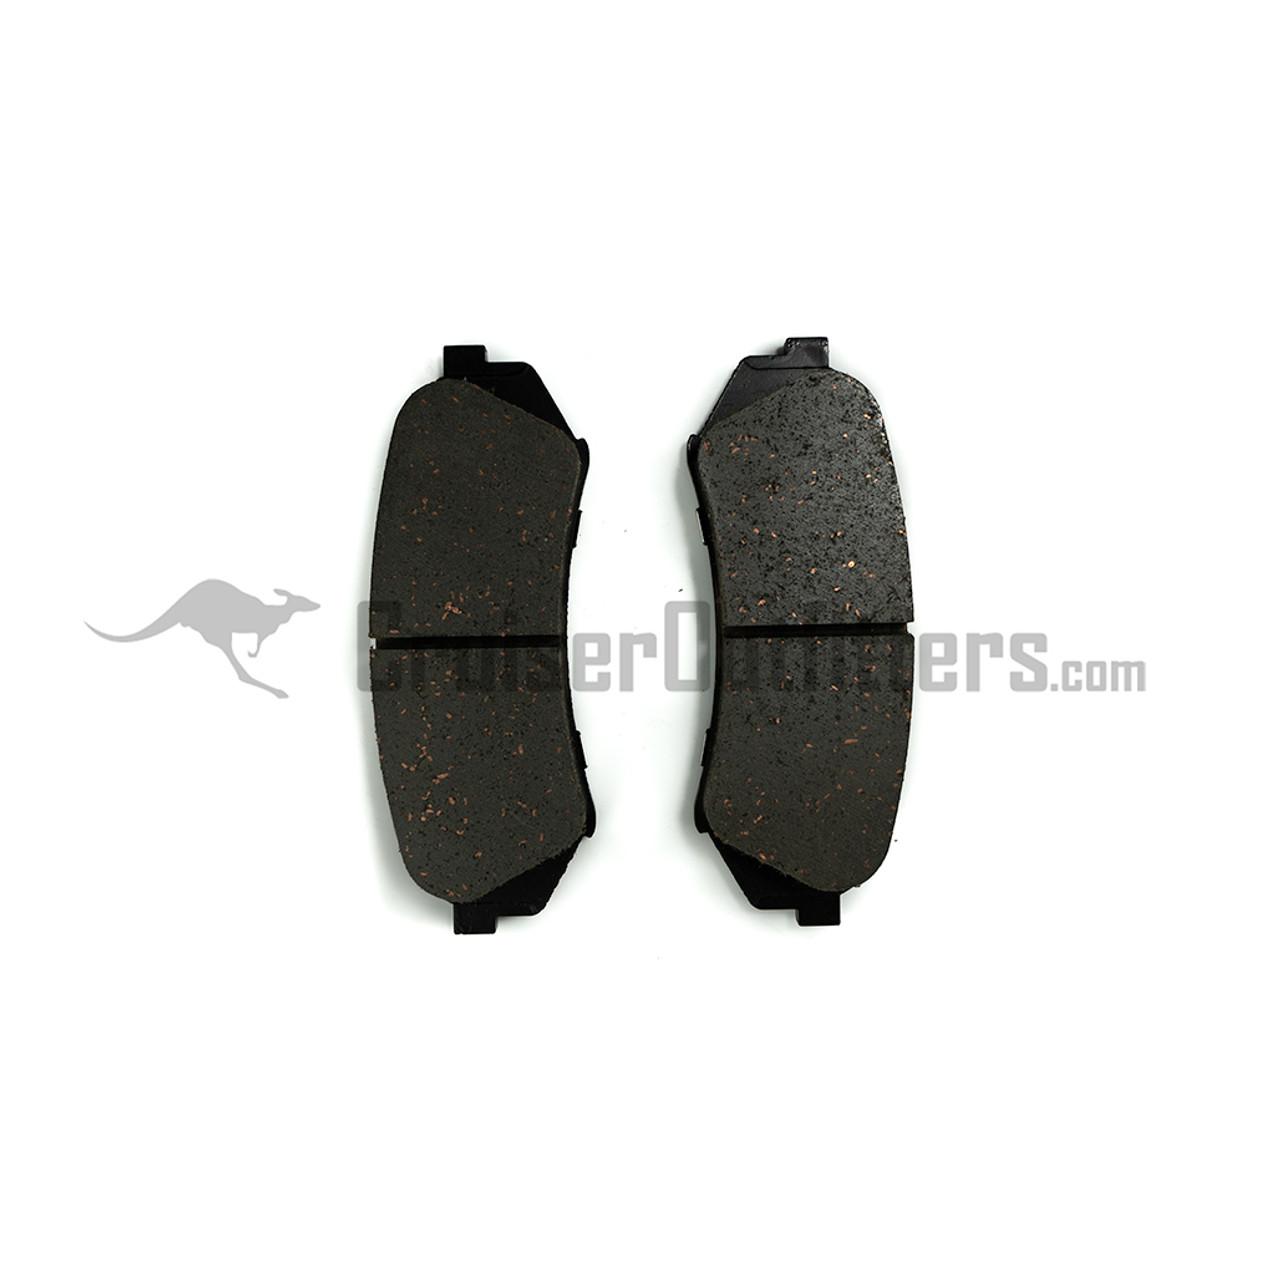 BRAD0773 - Rear Brake Pads - Fits 1998 - 2007 100 Series